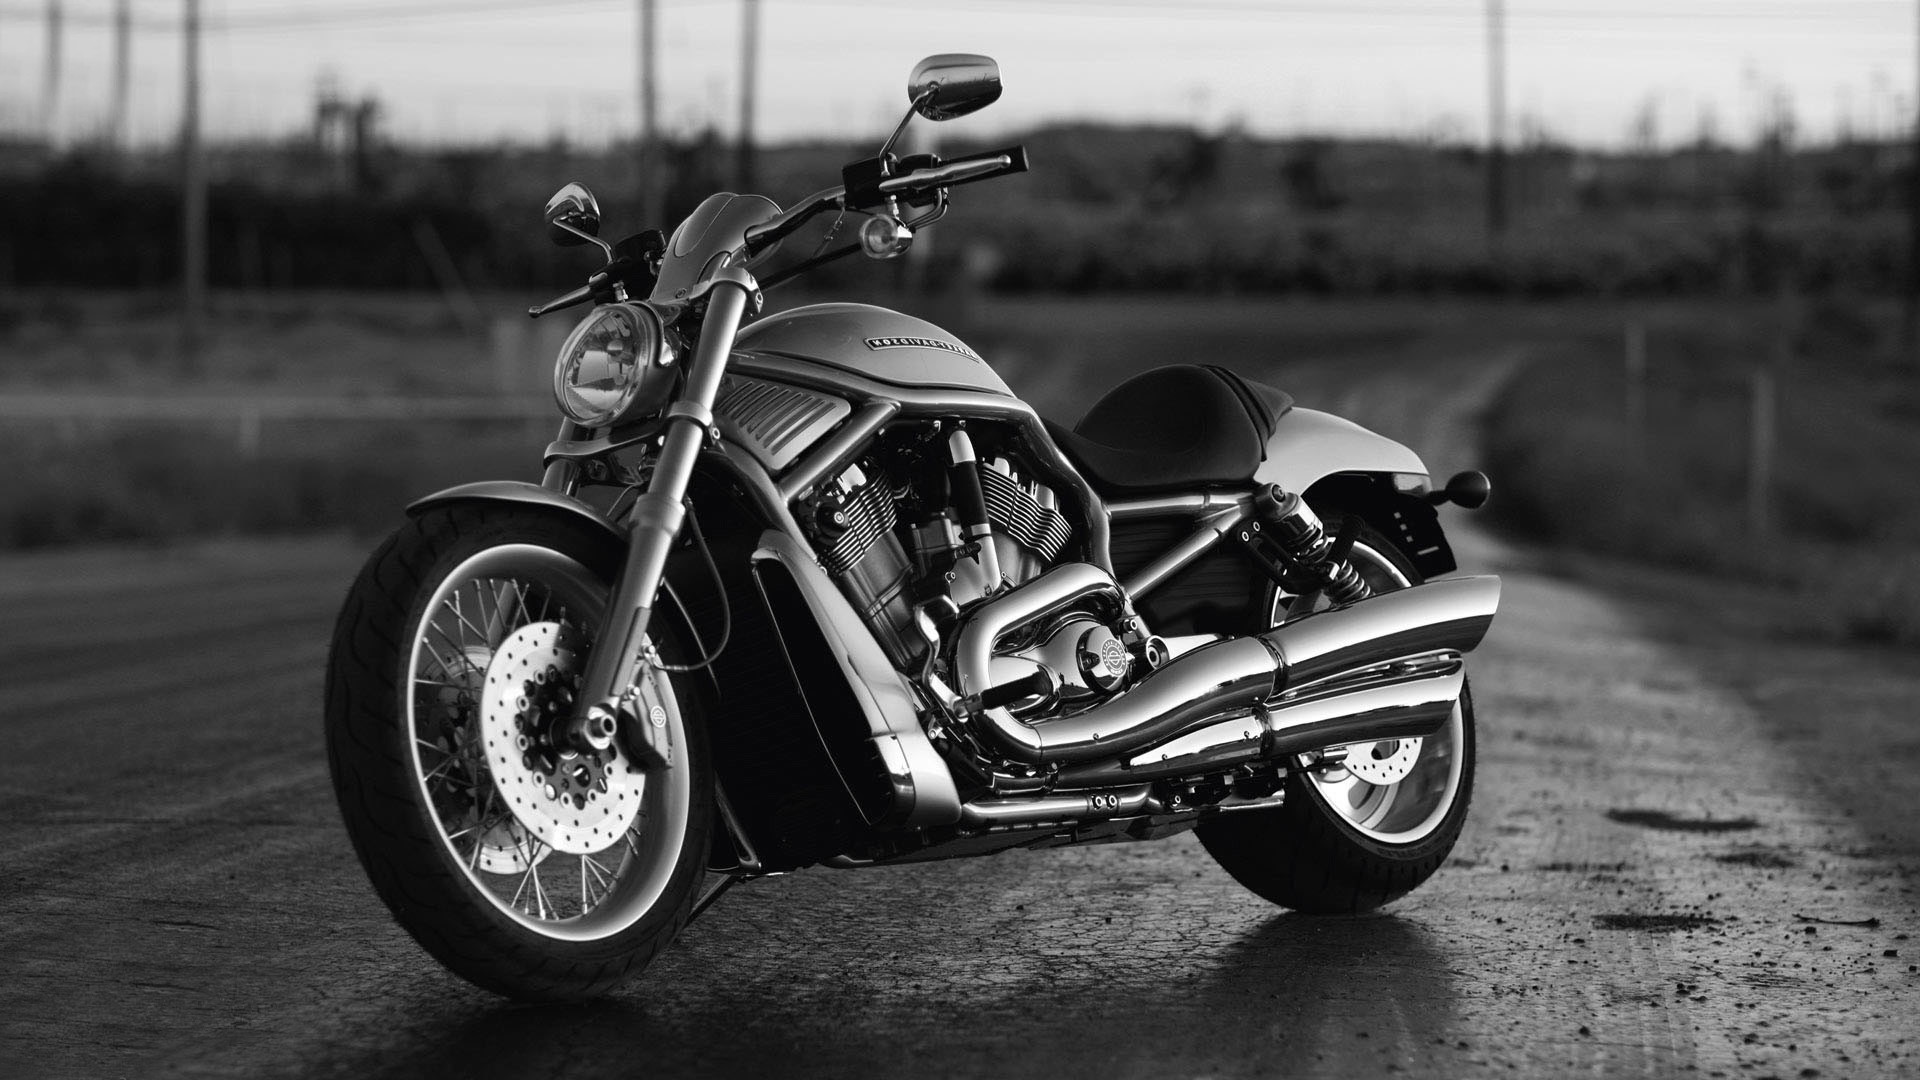 Harley Davidson Pics Wallpapers 67 Images